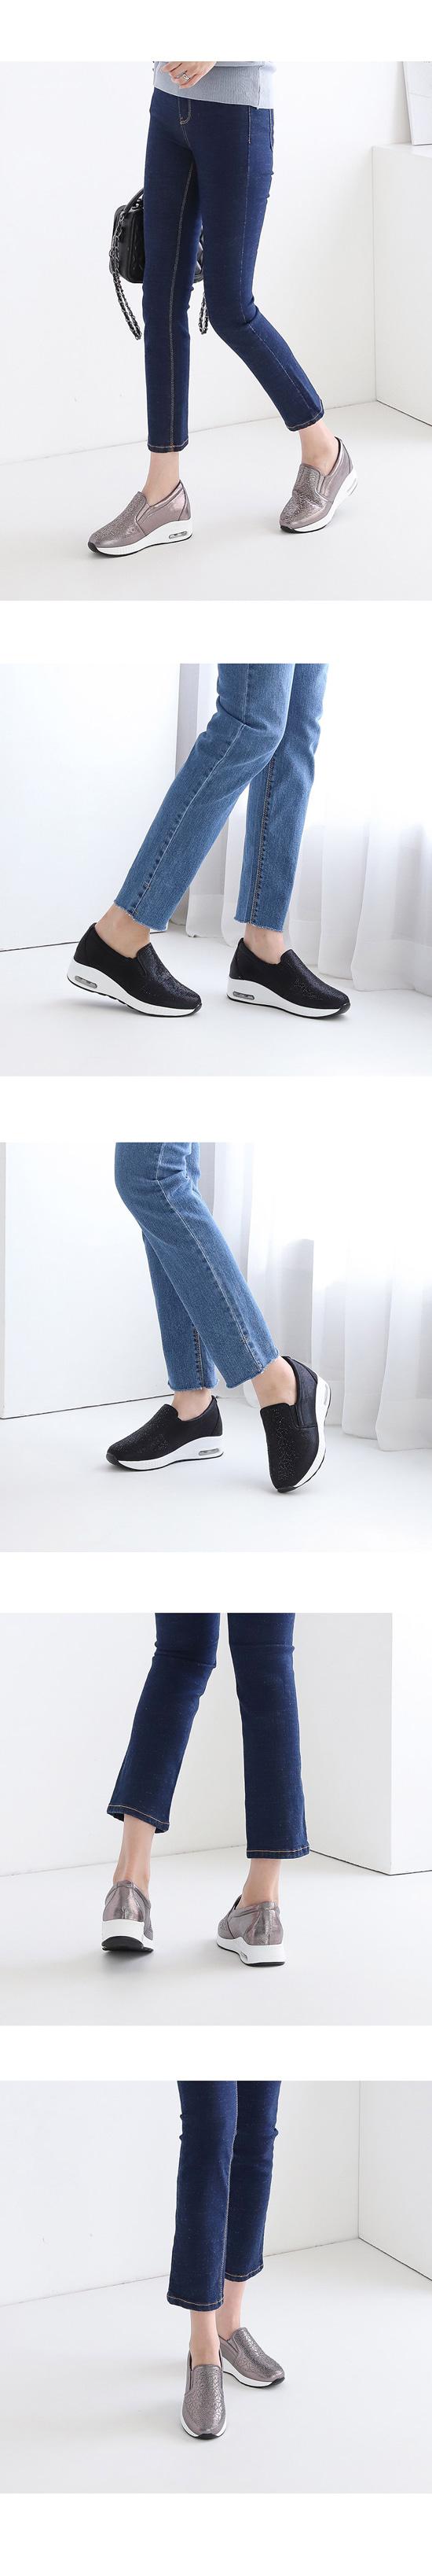 Stone stud slip-on sneakers silver